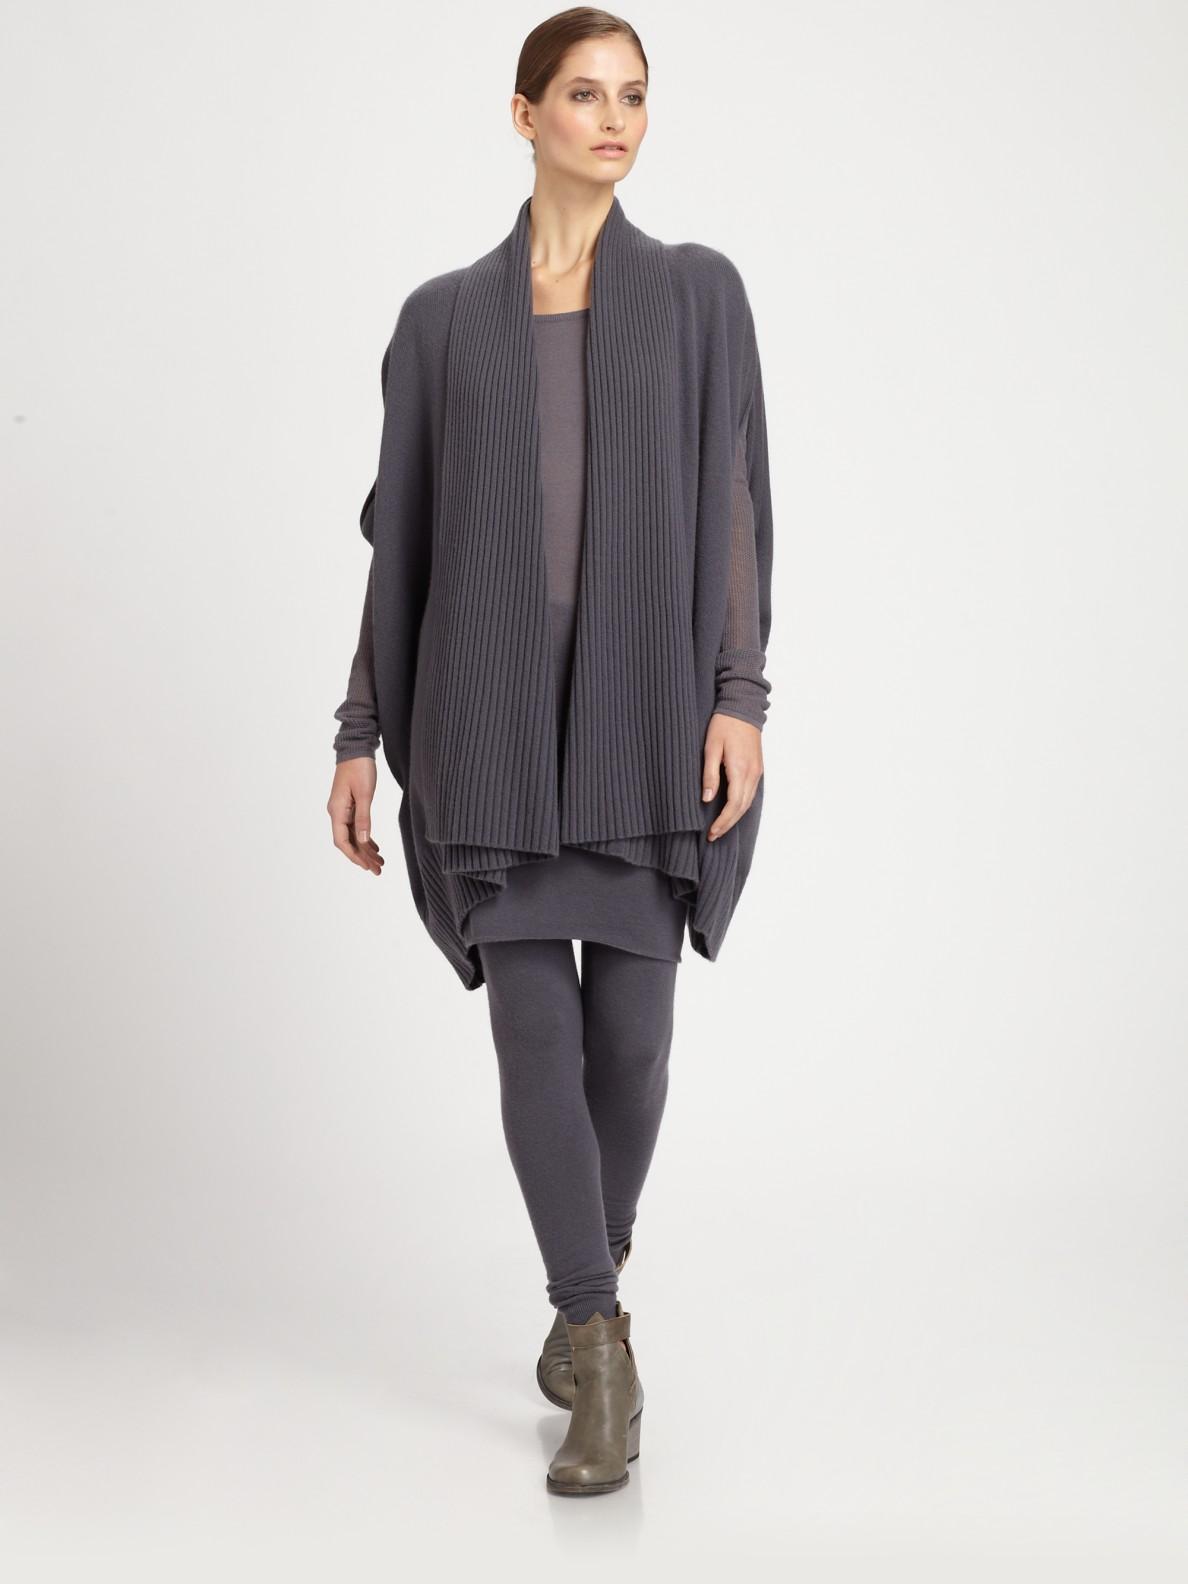 donna karan new york cashmere cardigan in gray black lyst. Black Bedroom Furniture Sets. Home Design Ideas